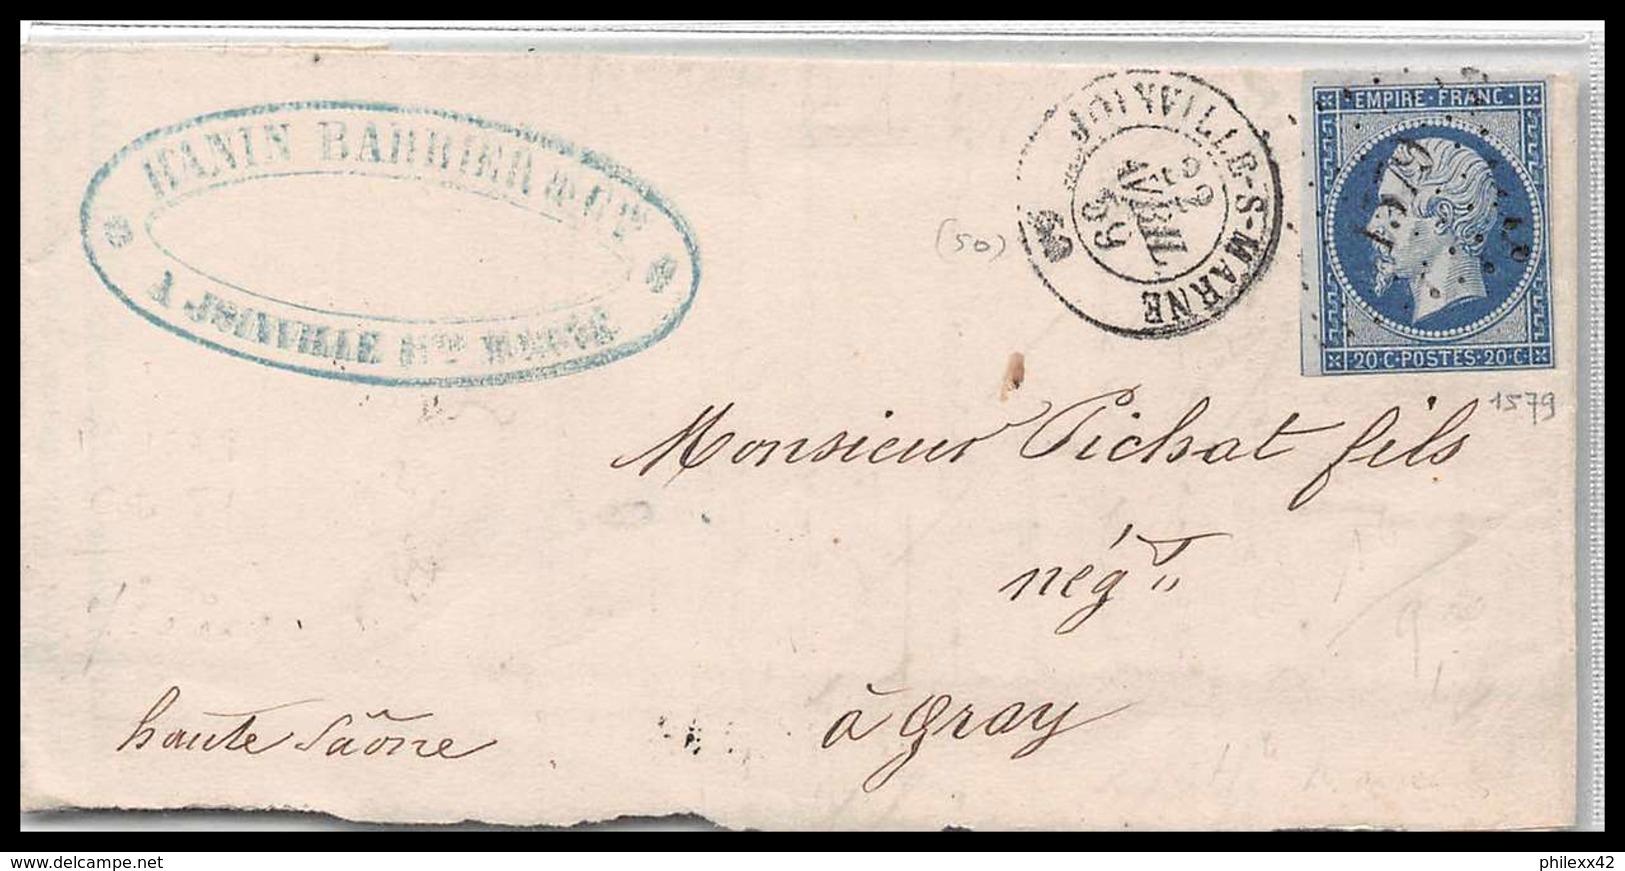 LAC Lettre Cover France 1953 Haute-Marne Napoléon N°14 T1 Pc 1579 Joinville Sur Marne Pour Gray Haute Saone 22/4/1859 - 1849-1876: Classic Period